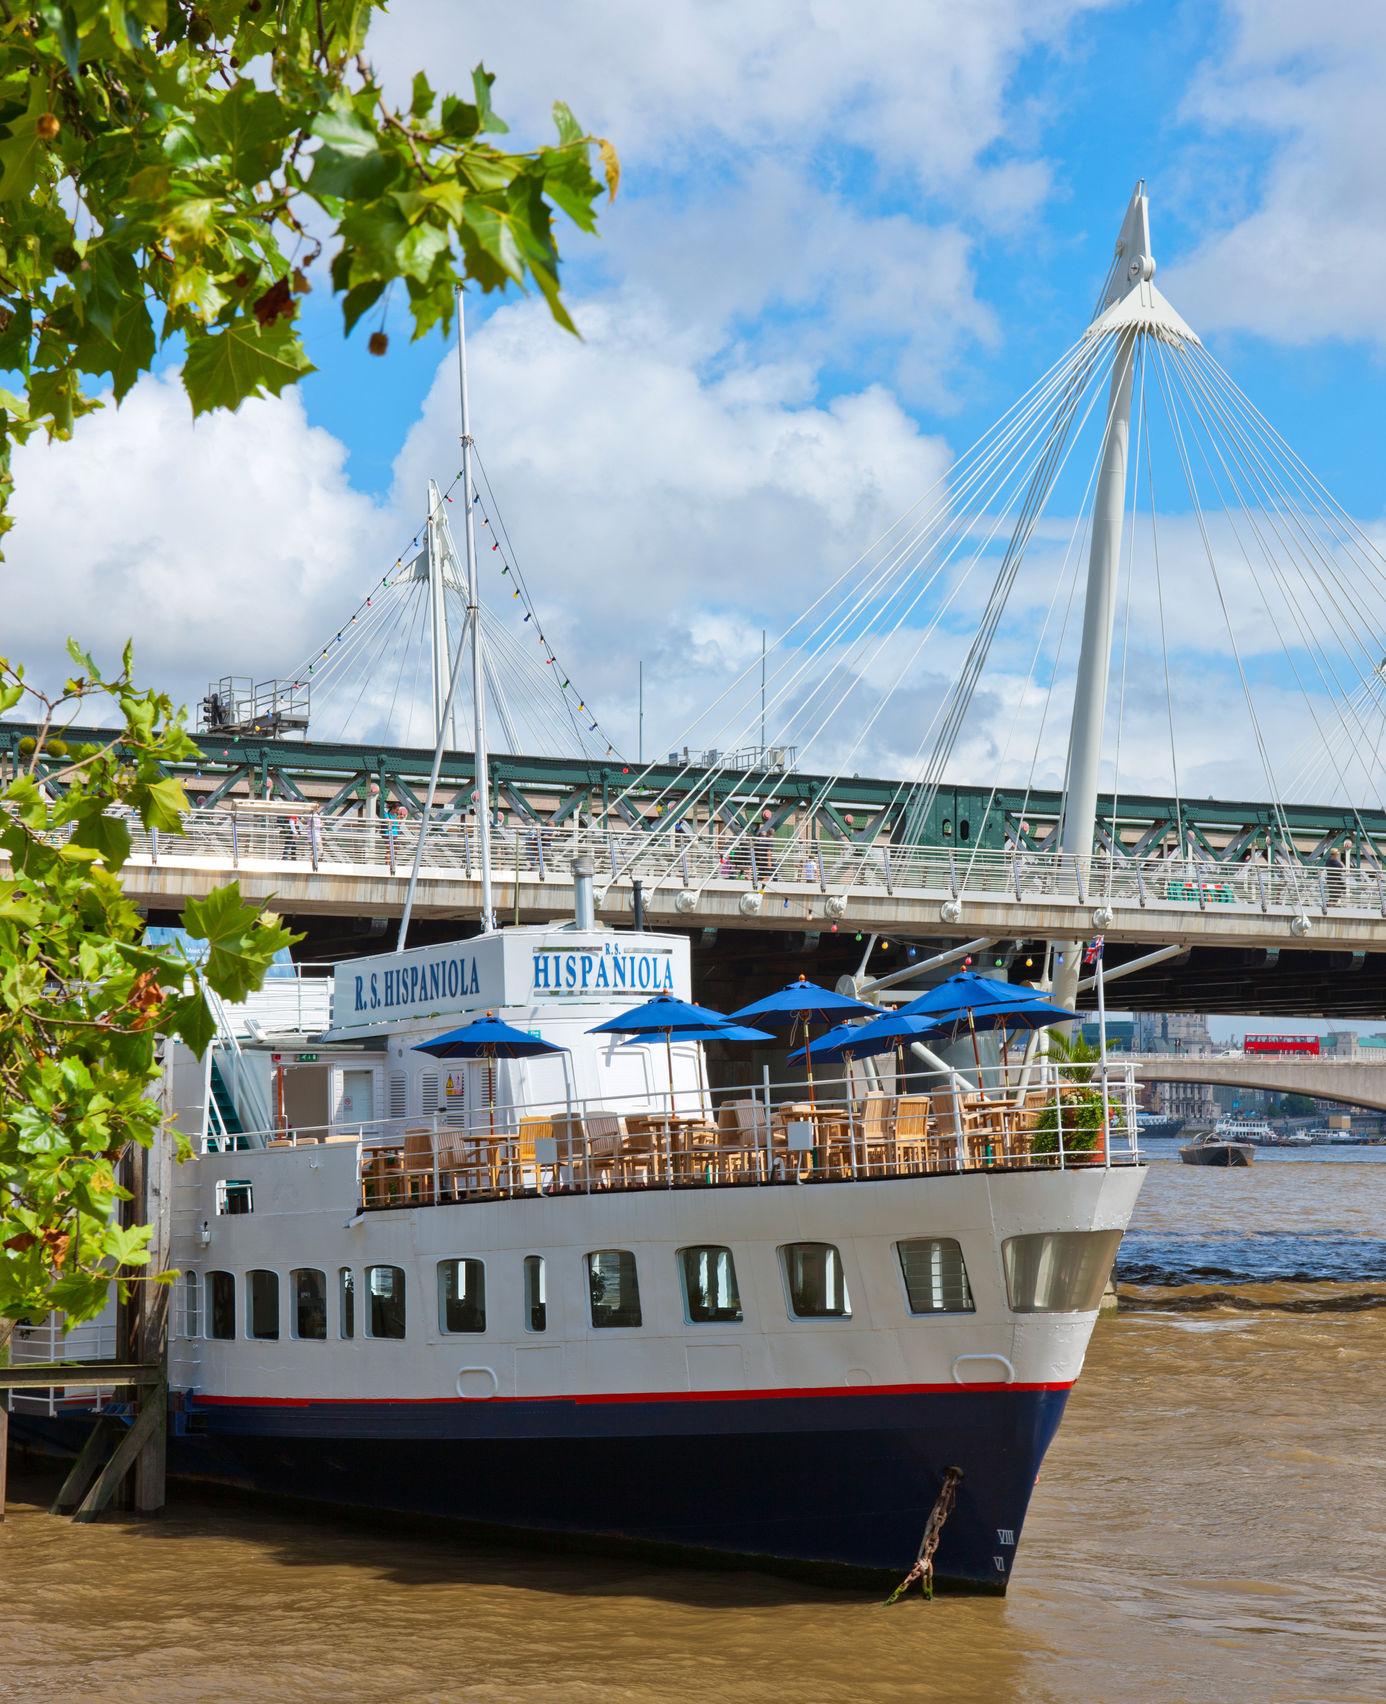 Boat Hire, R.S. Hispaniola